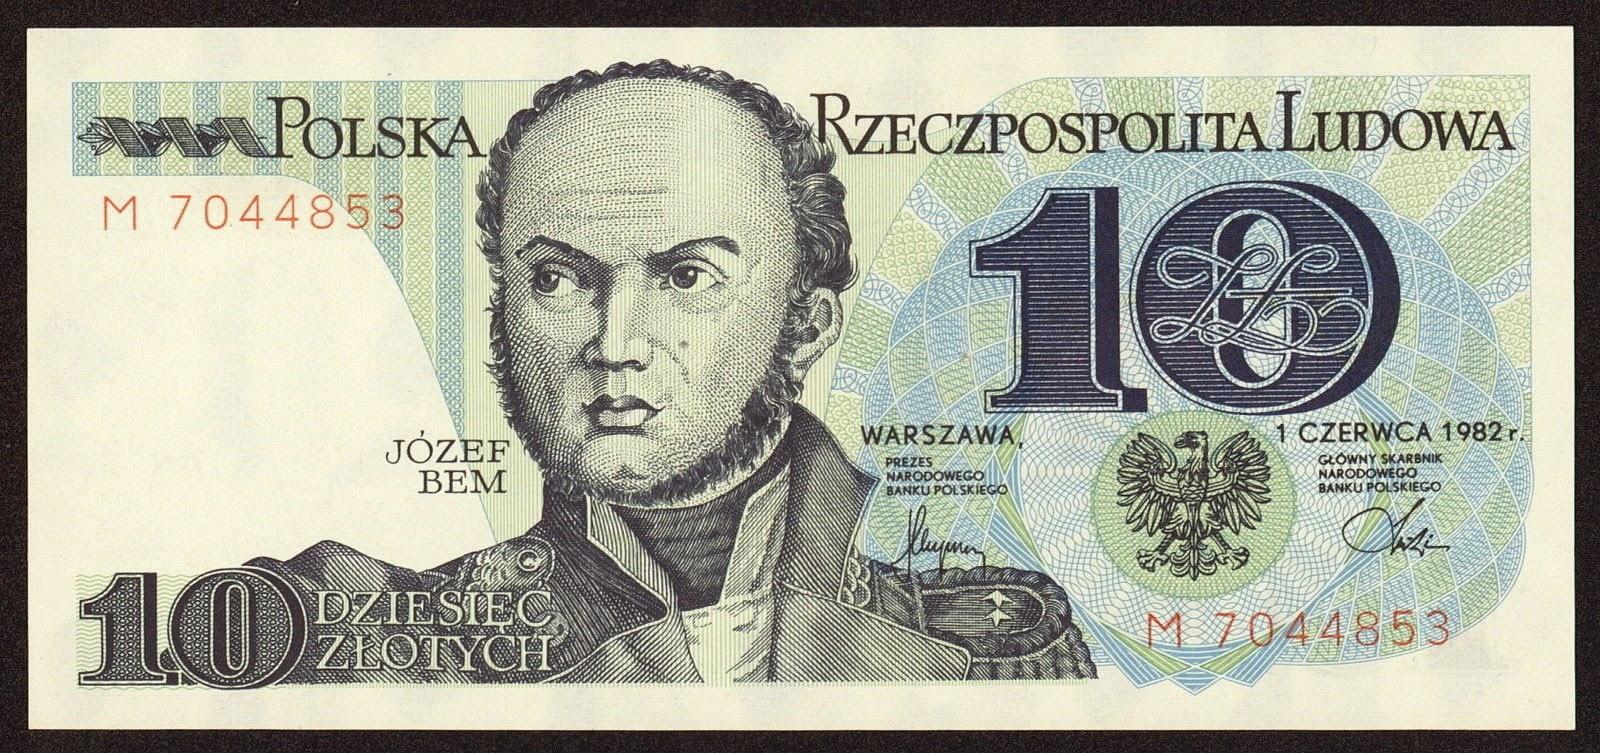 Poland Banknotes 10 Zloty banknote 1982 Jozef Bem